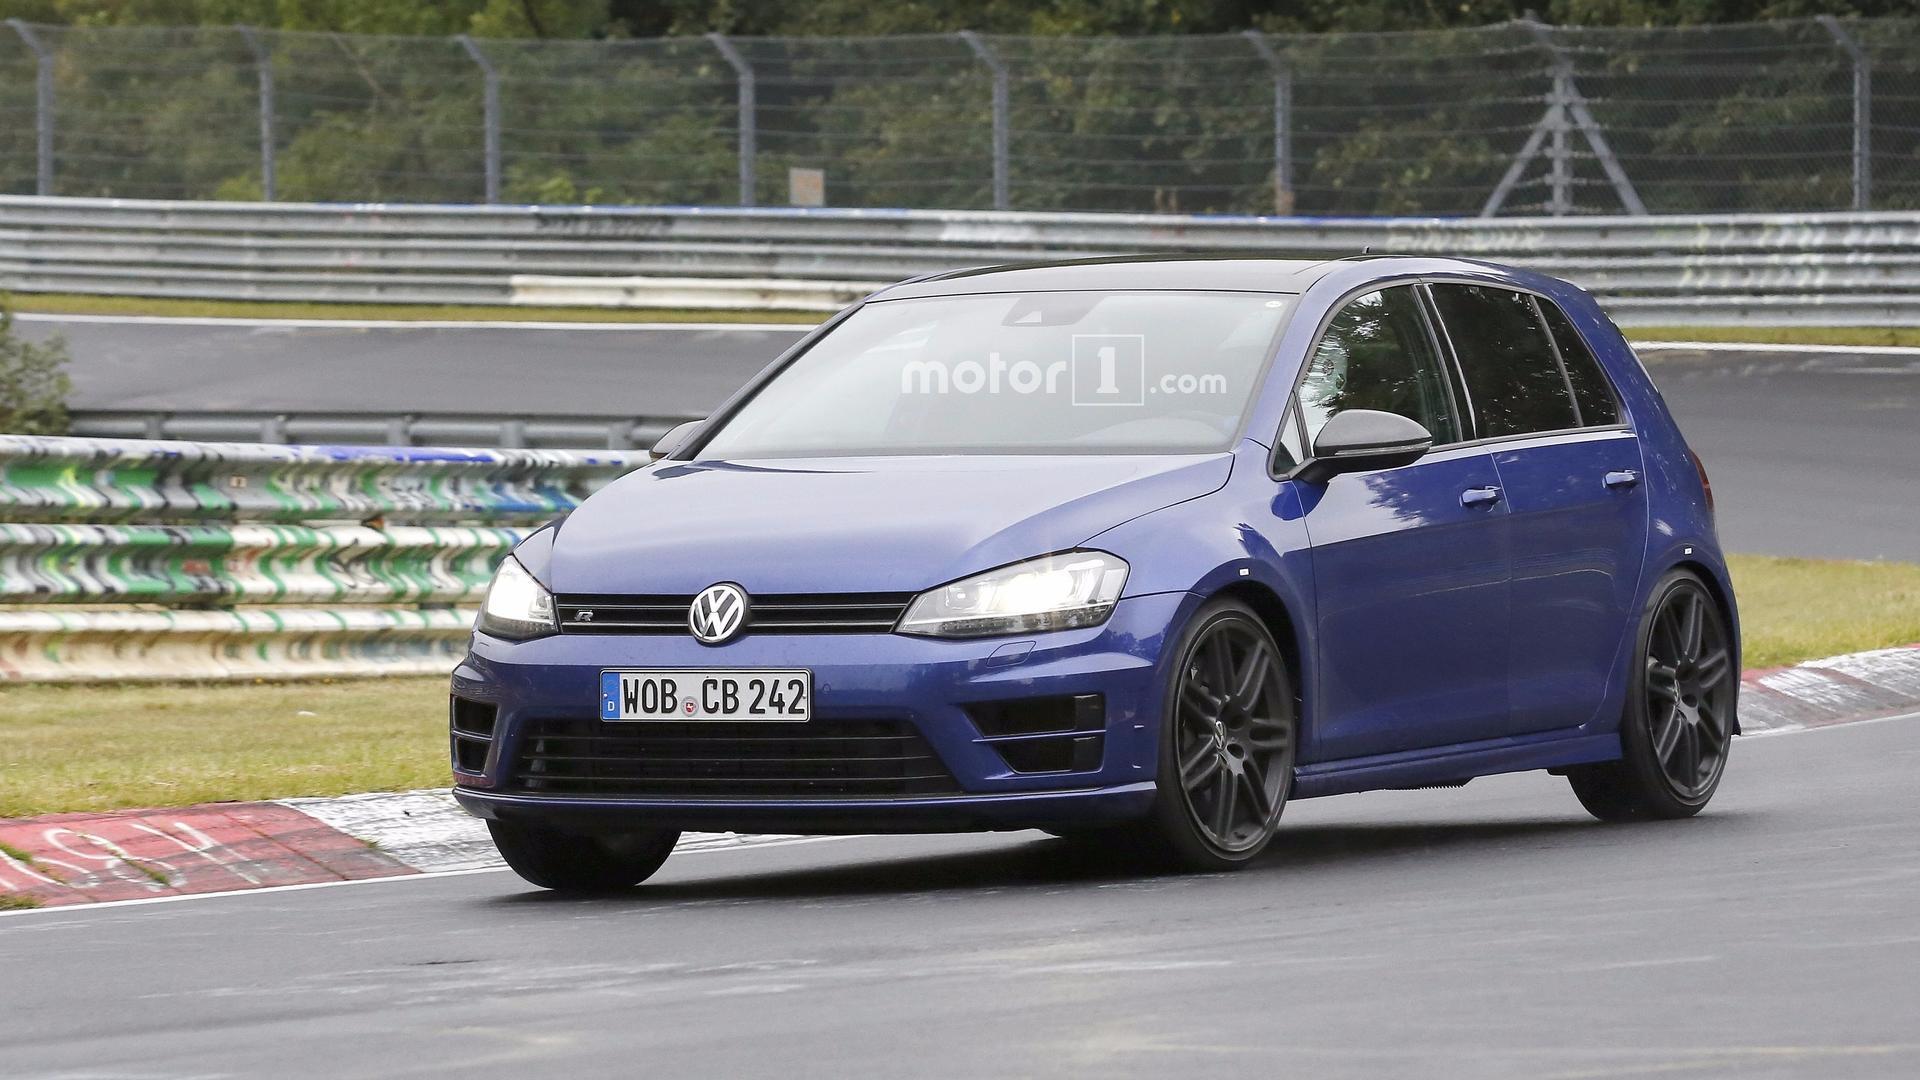 Volkswagen снова вывел на тесты заряженный хэтчбек Golf R420 1